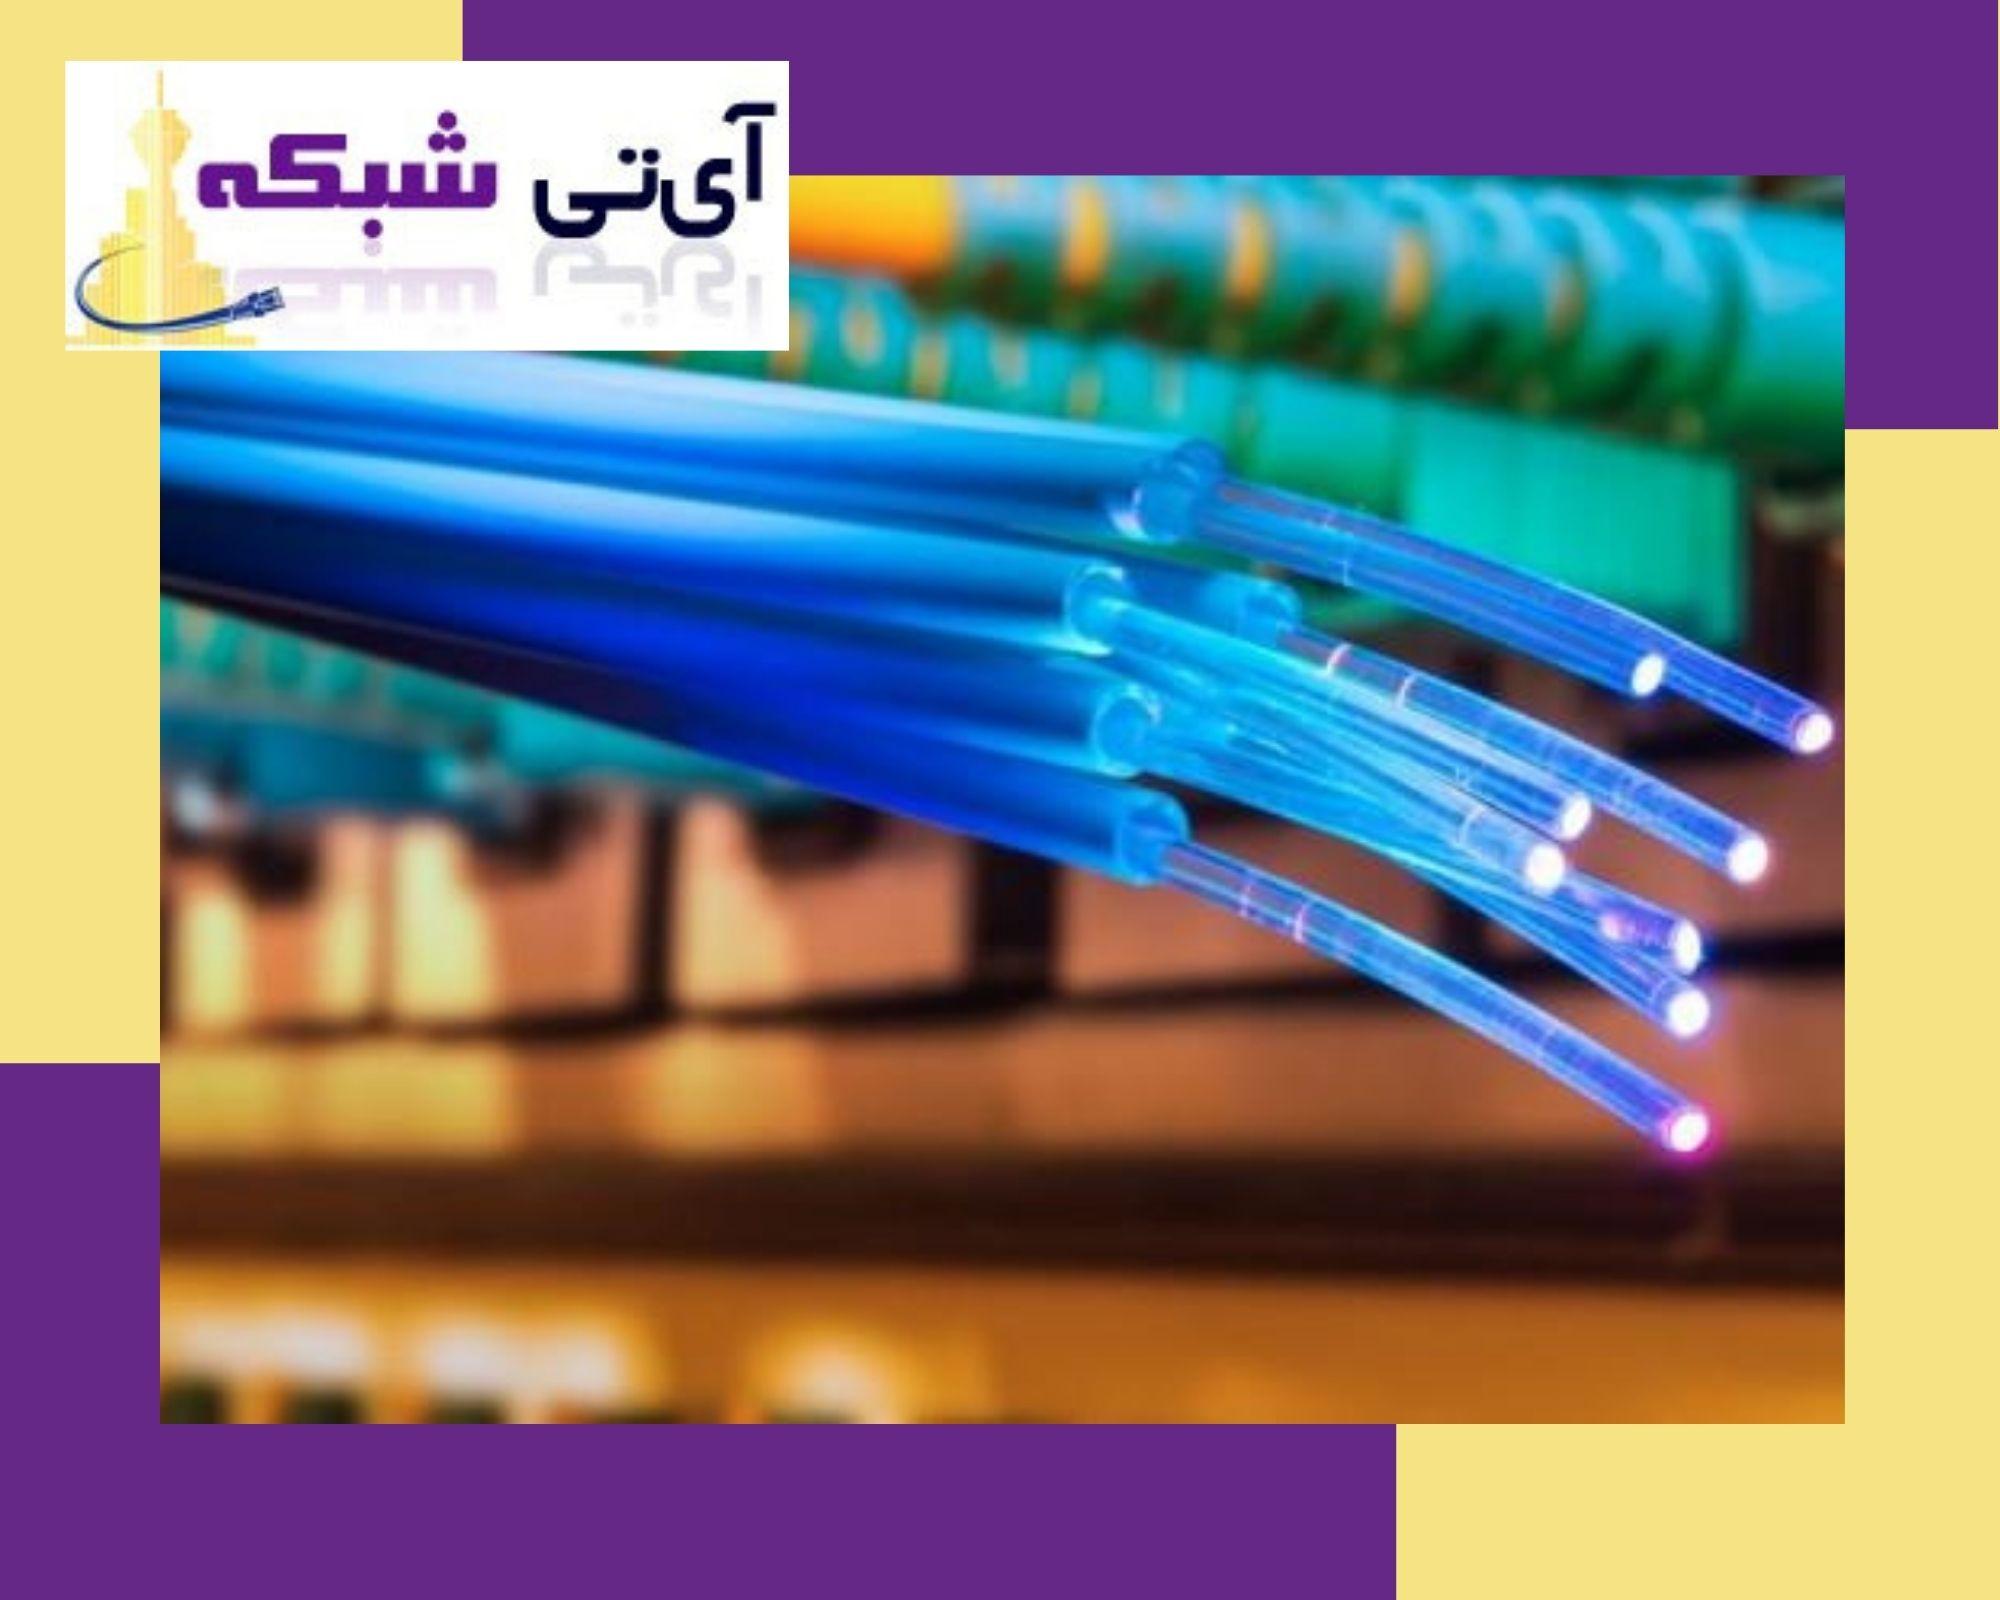 قیمت - کابل - فیبر - نوری - ای تی - شبکه